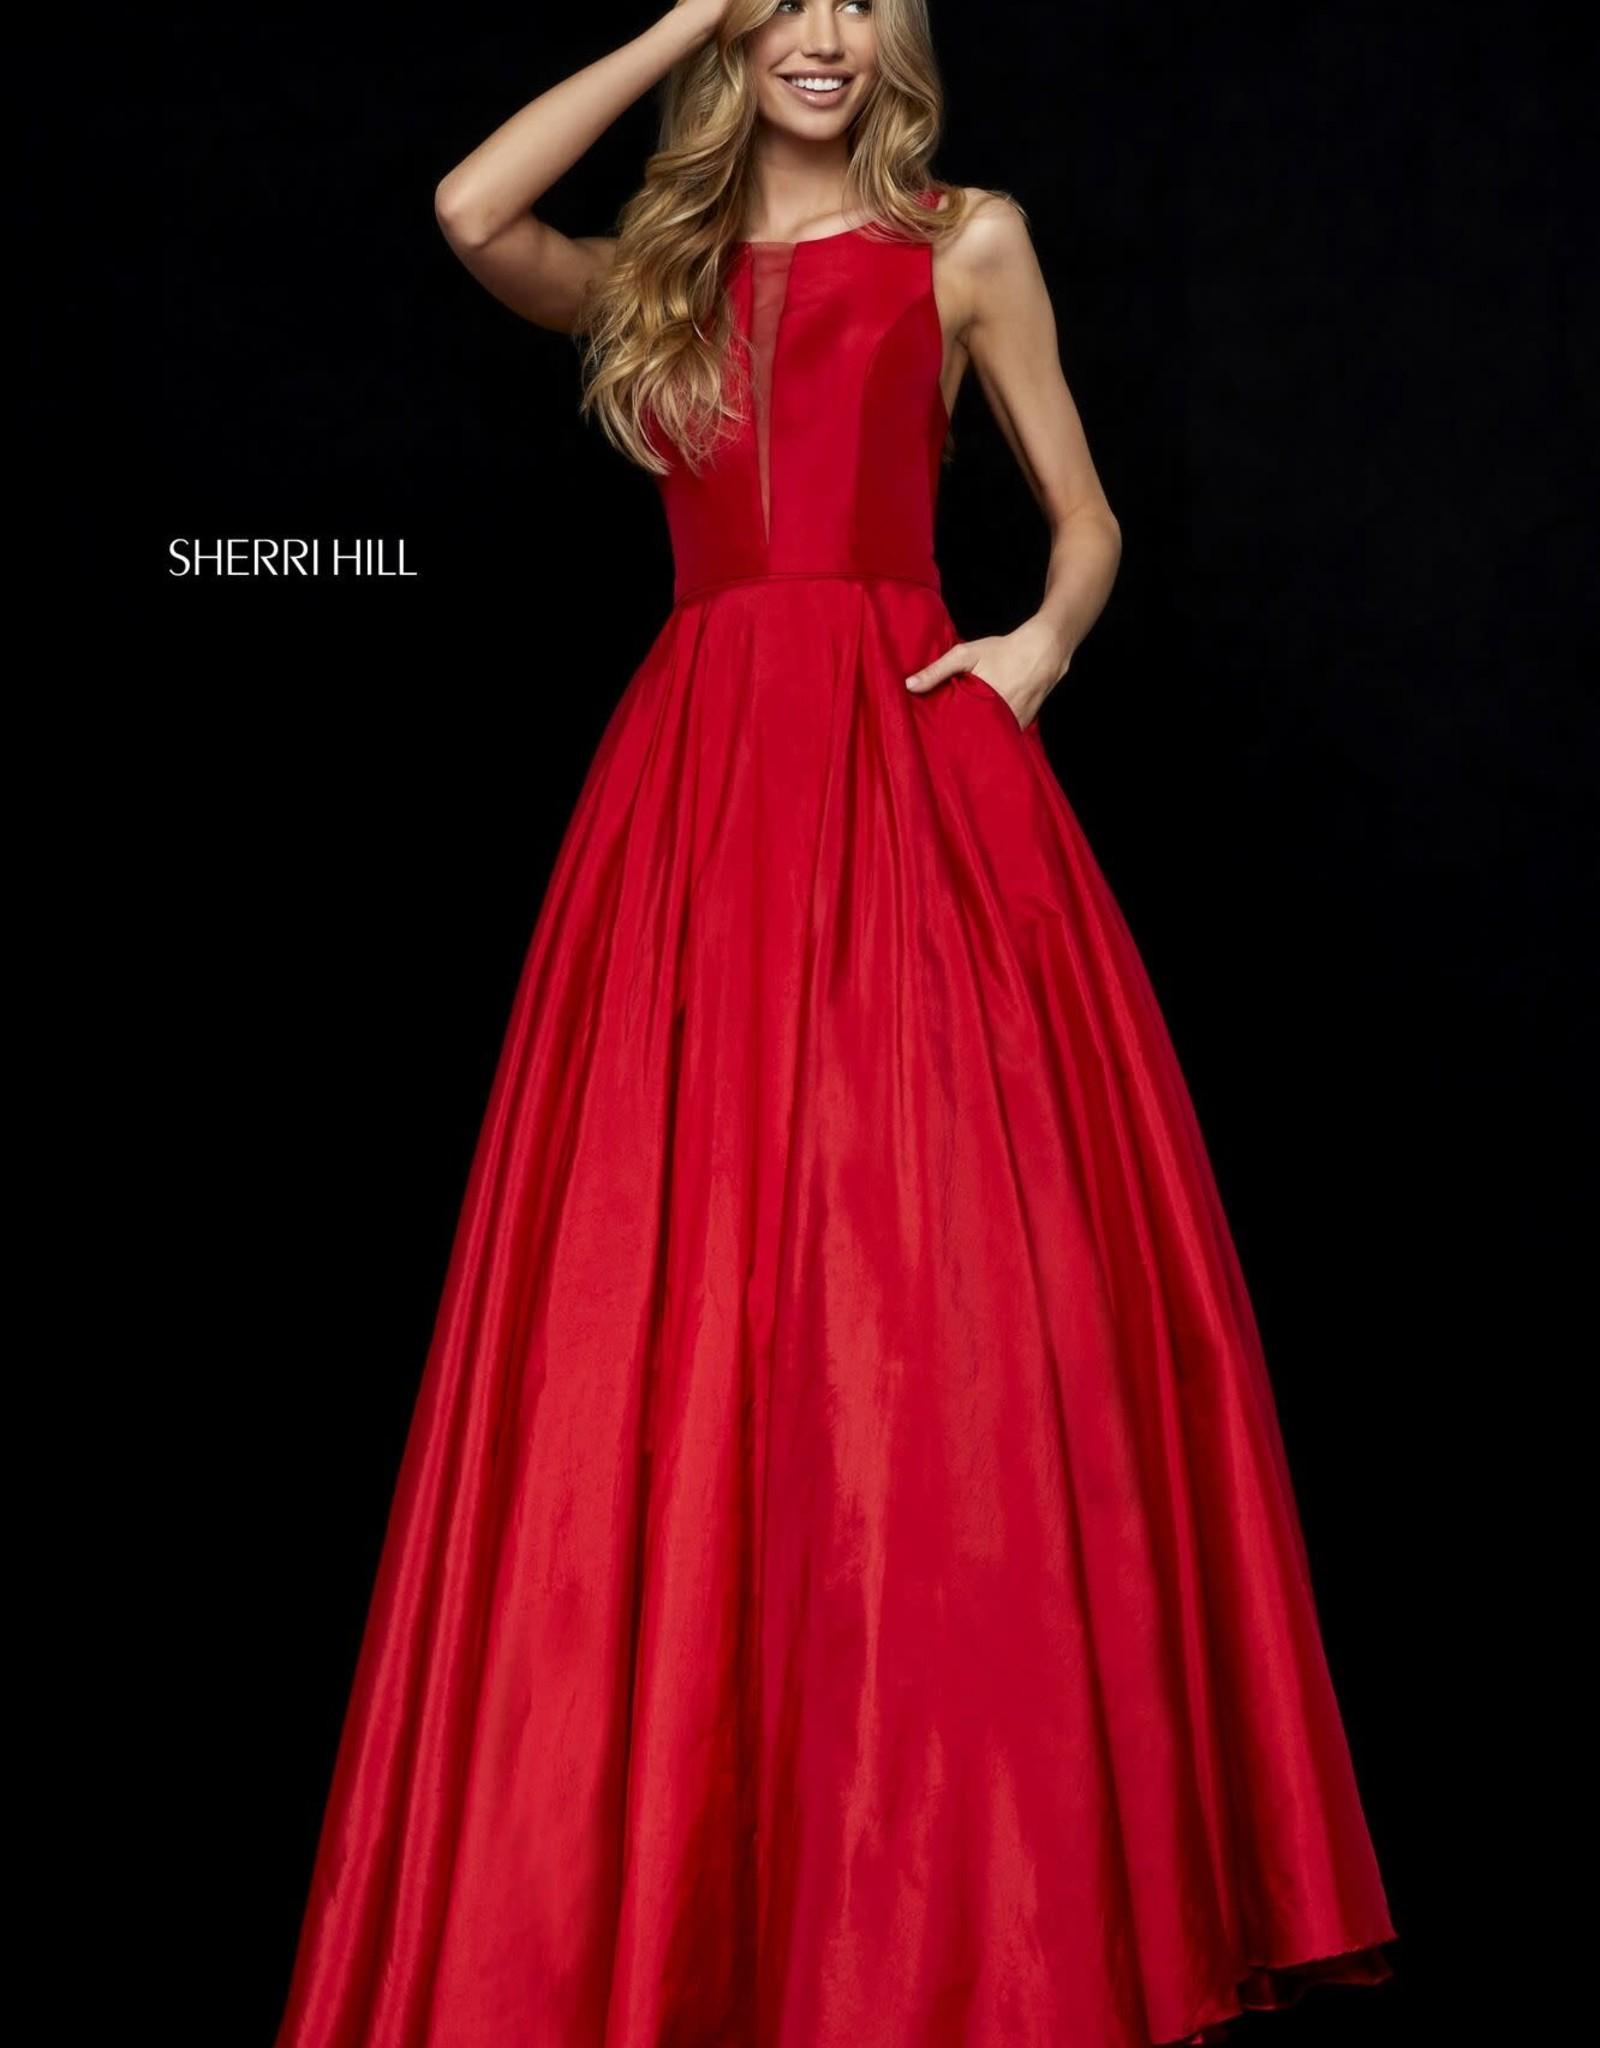 Sherri Hill Sherri Hill Red 0